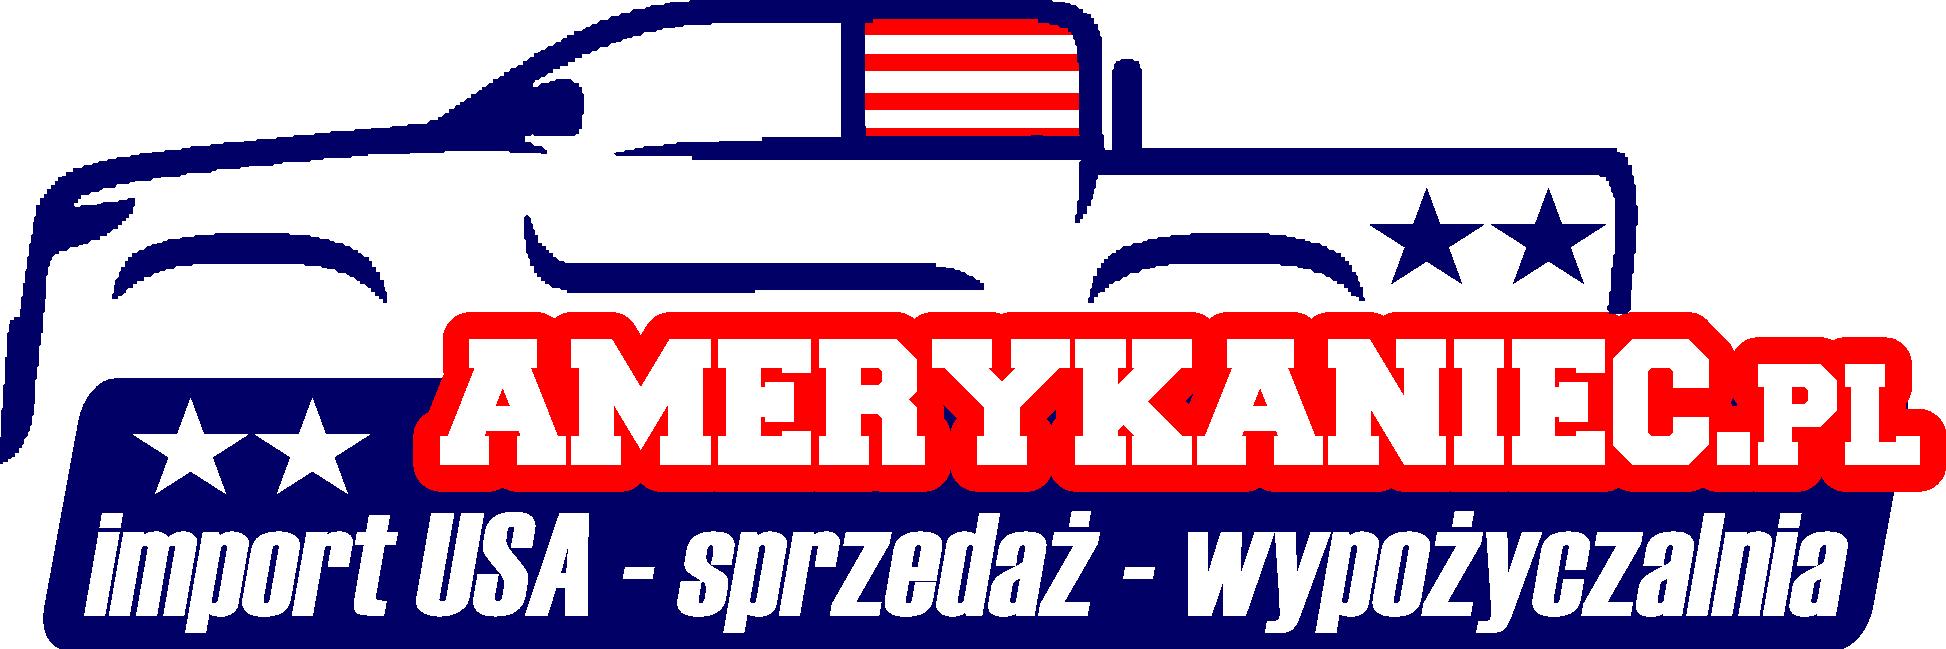 Amerykaniec.pl